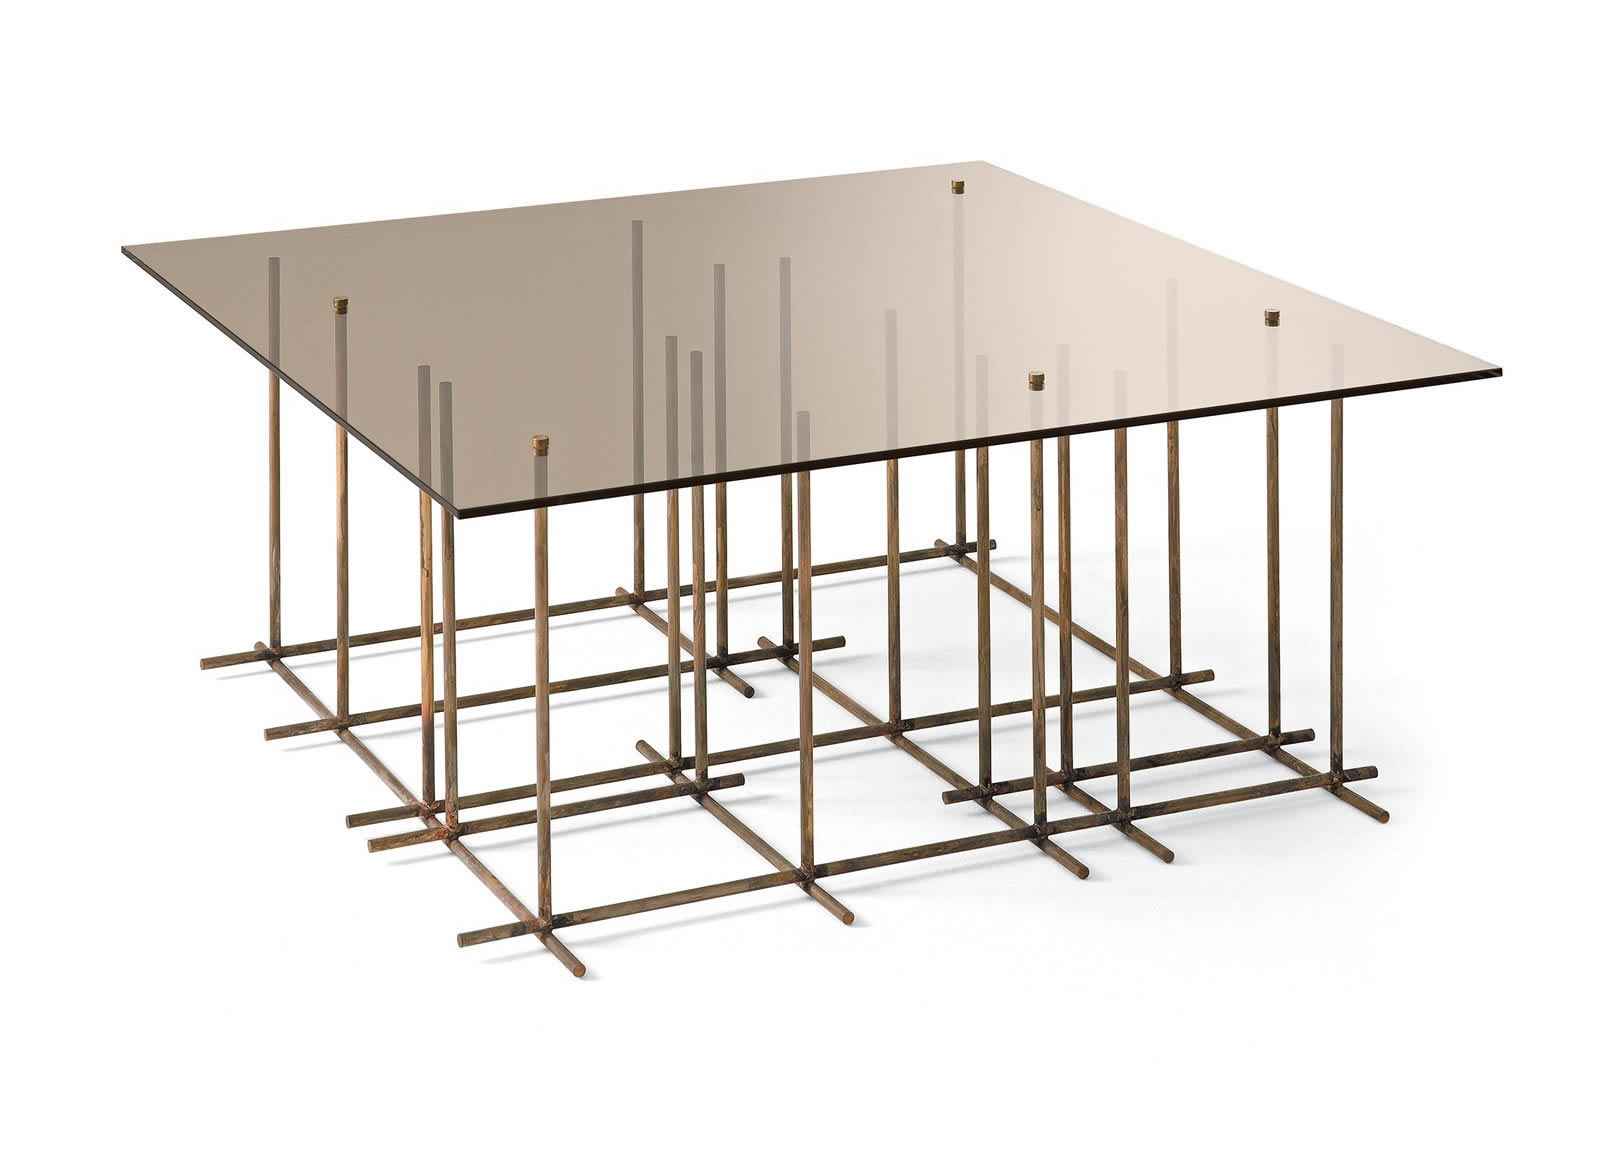 Tetris Coffee Table by Massimo Castagna for Gallotti&Radice